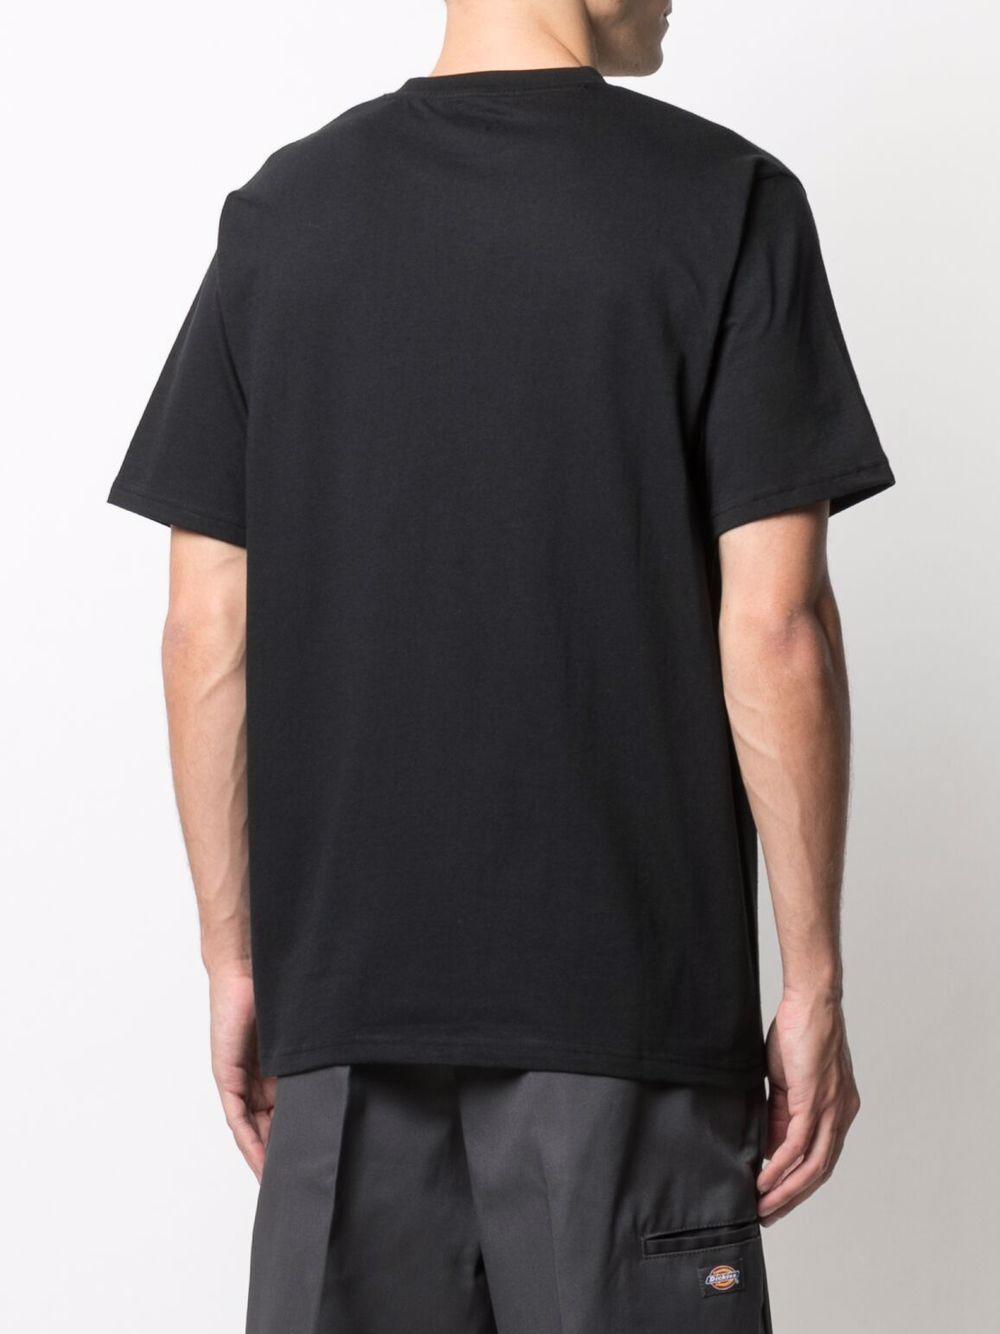 Dickies t-shirt con logo uomo DICKIES | T-shirt | DK0A4XC9BLK